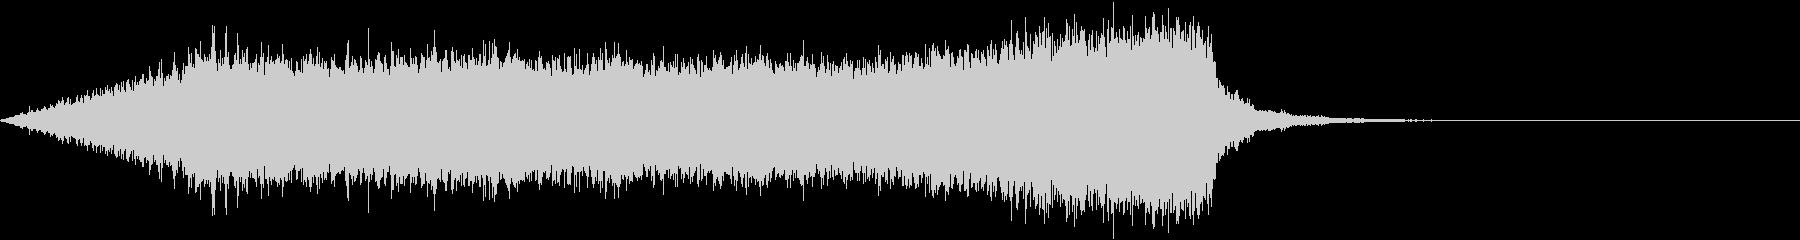 CINEMATIC RISER_42の未再生の波形